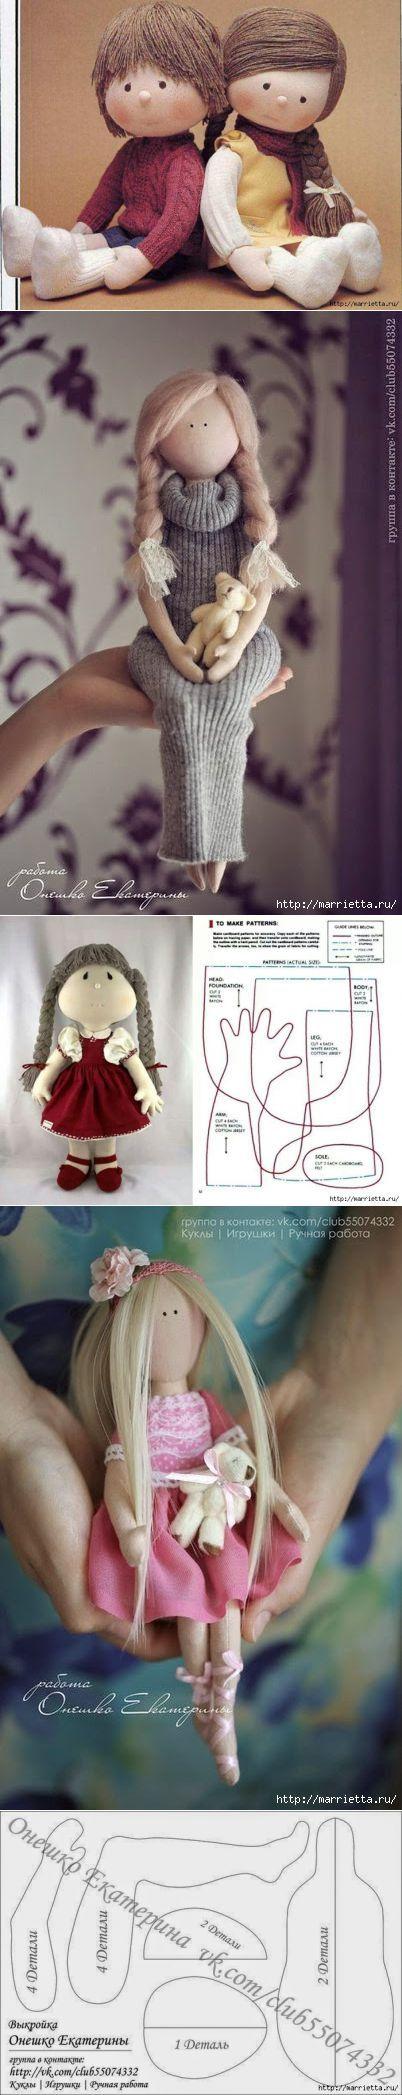 Шьем кукол. Выкройки и мастер-классы